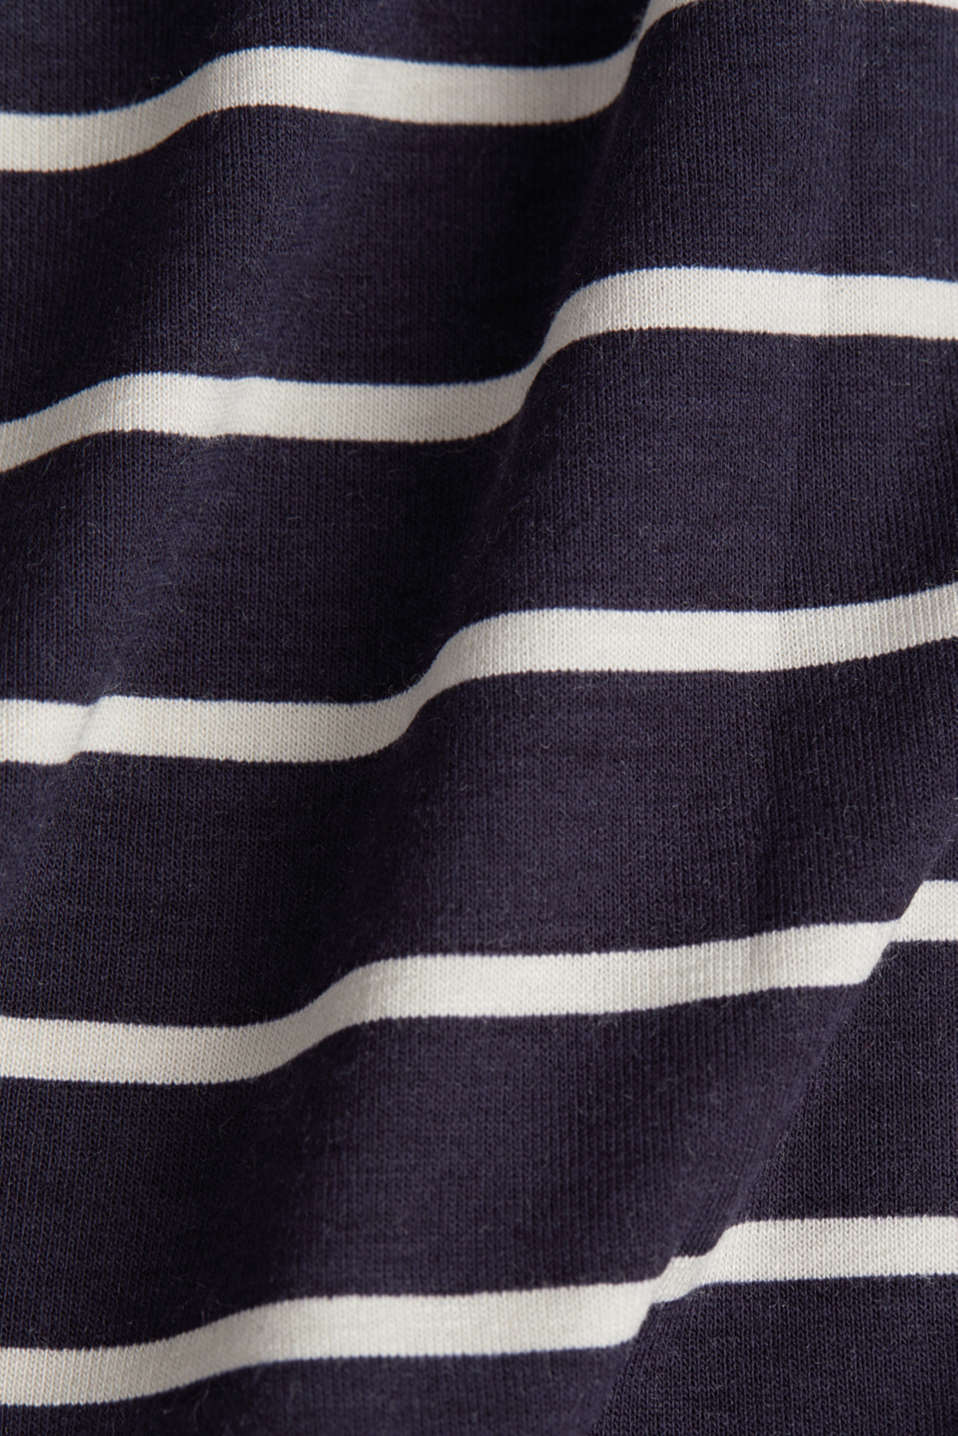 Flared jersey skirt, NAVY, detail image number 4